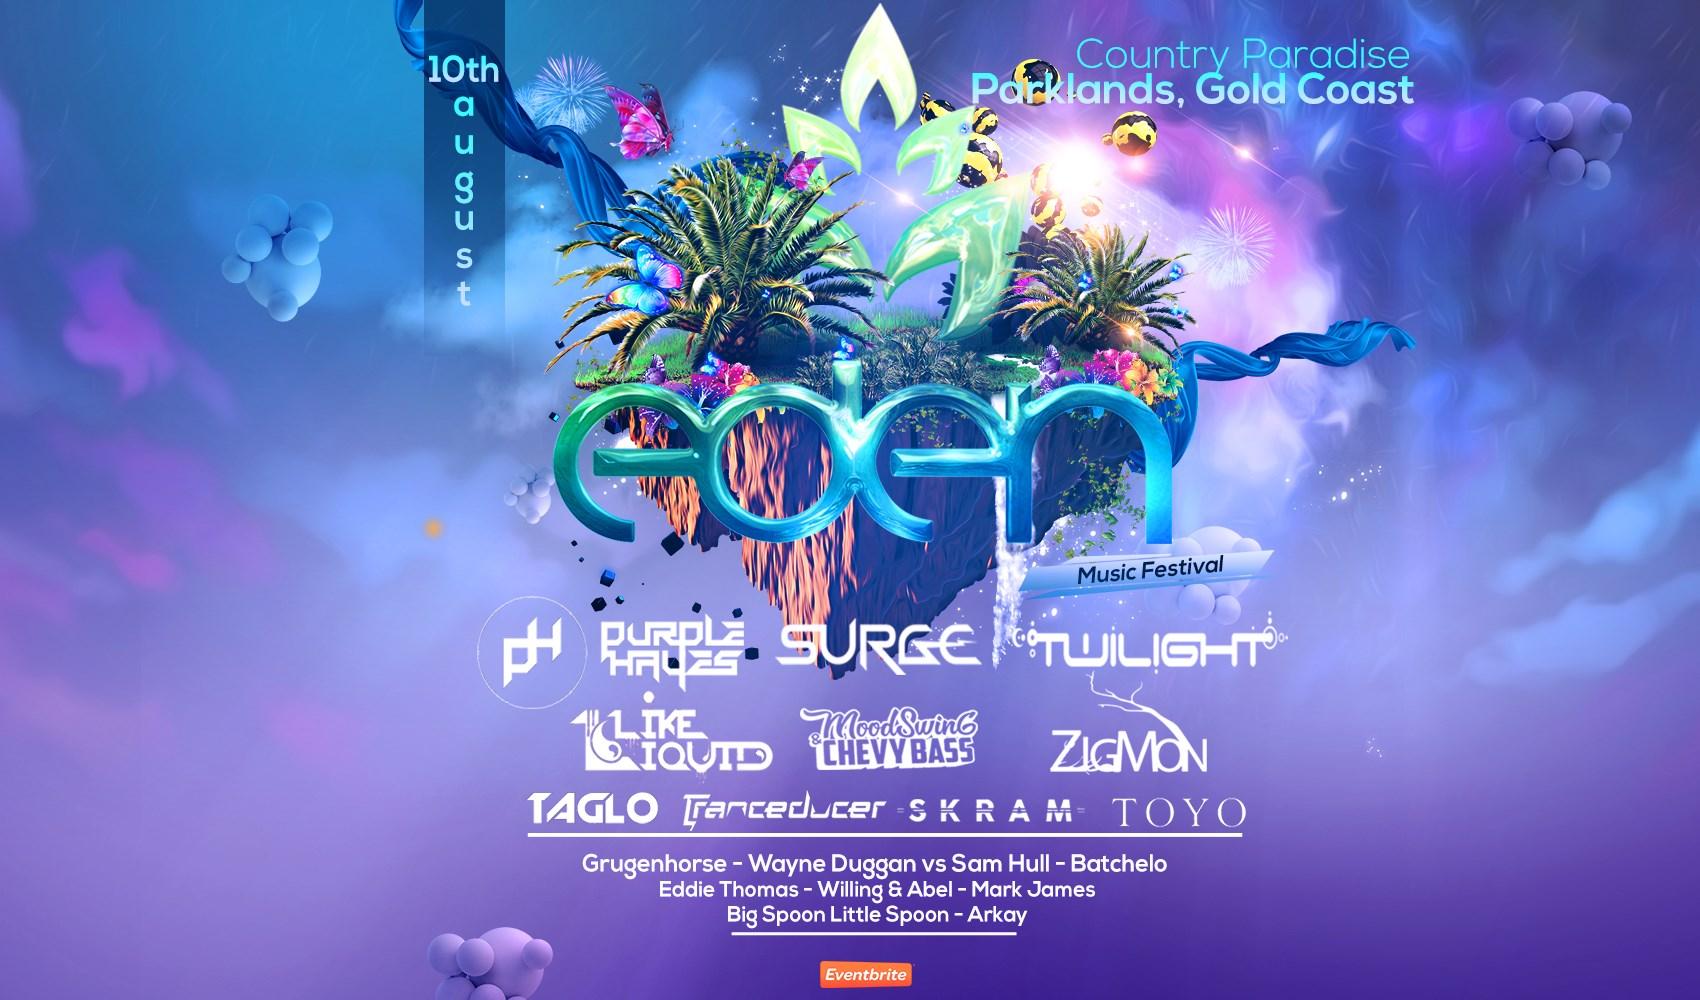 eden-music-festival-gold-coast-2019-oz-edm